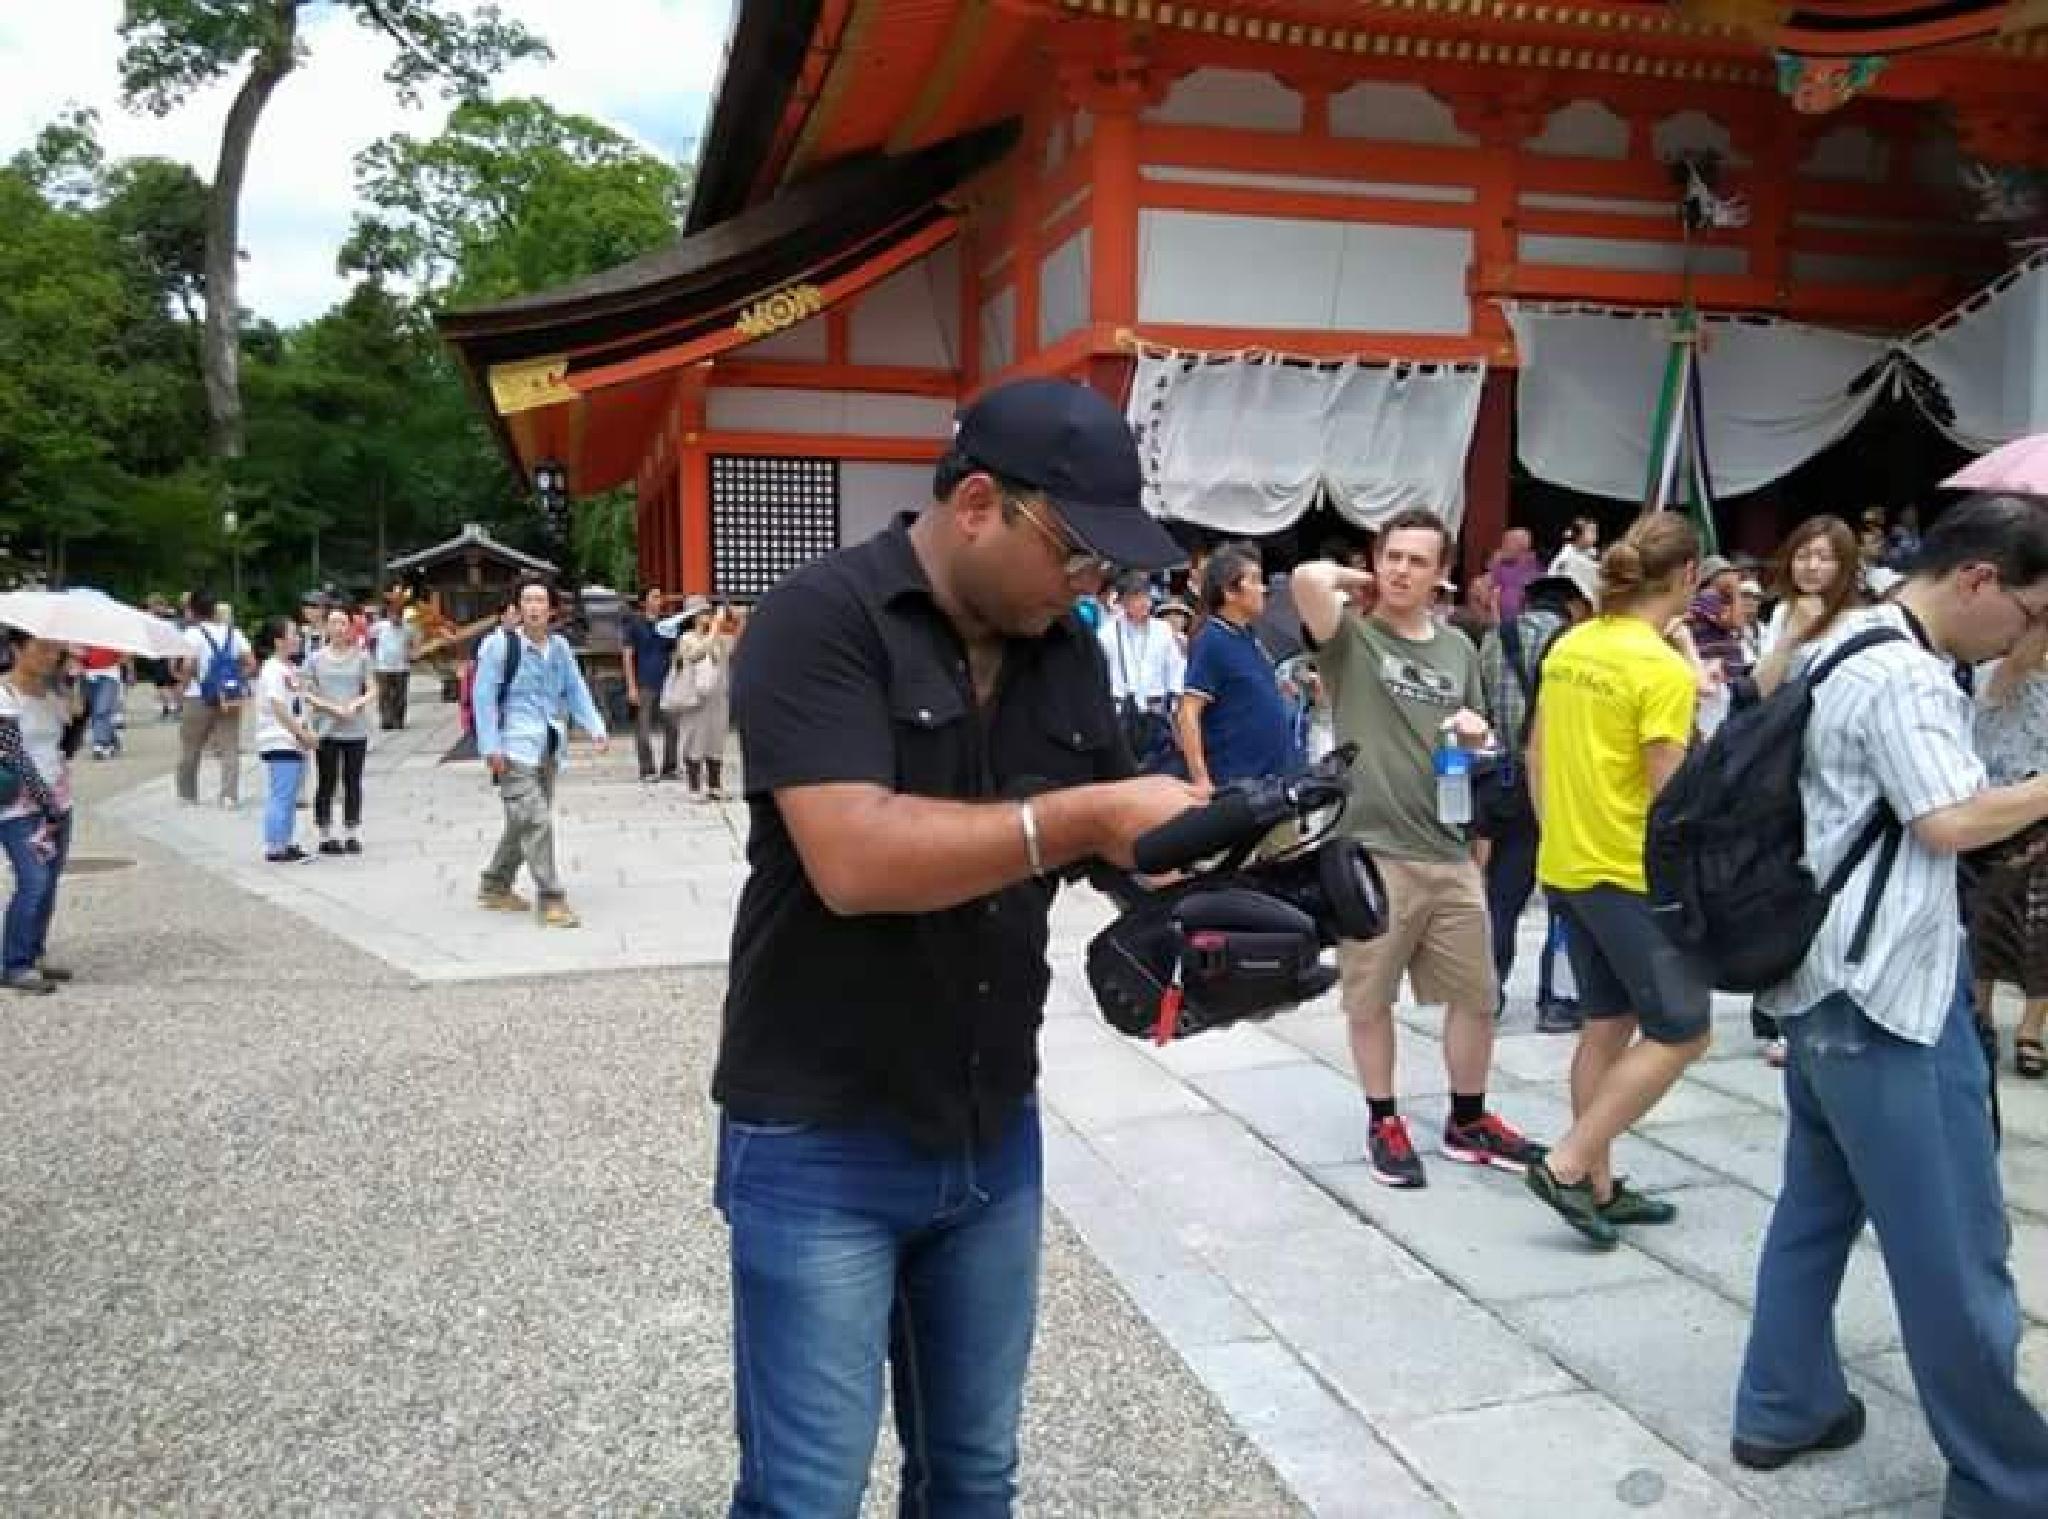 in japan for testing dvx200 panasonic  by jattinsinghnoulphotography